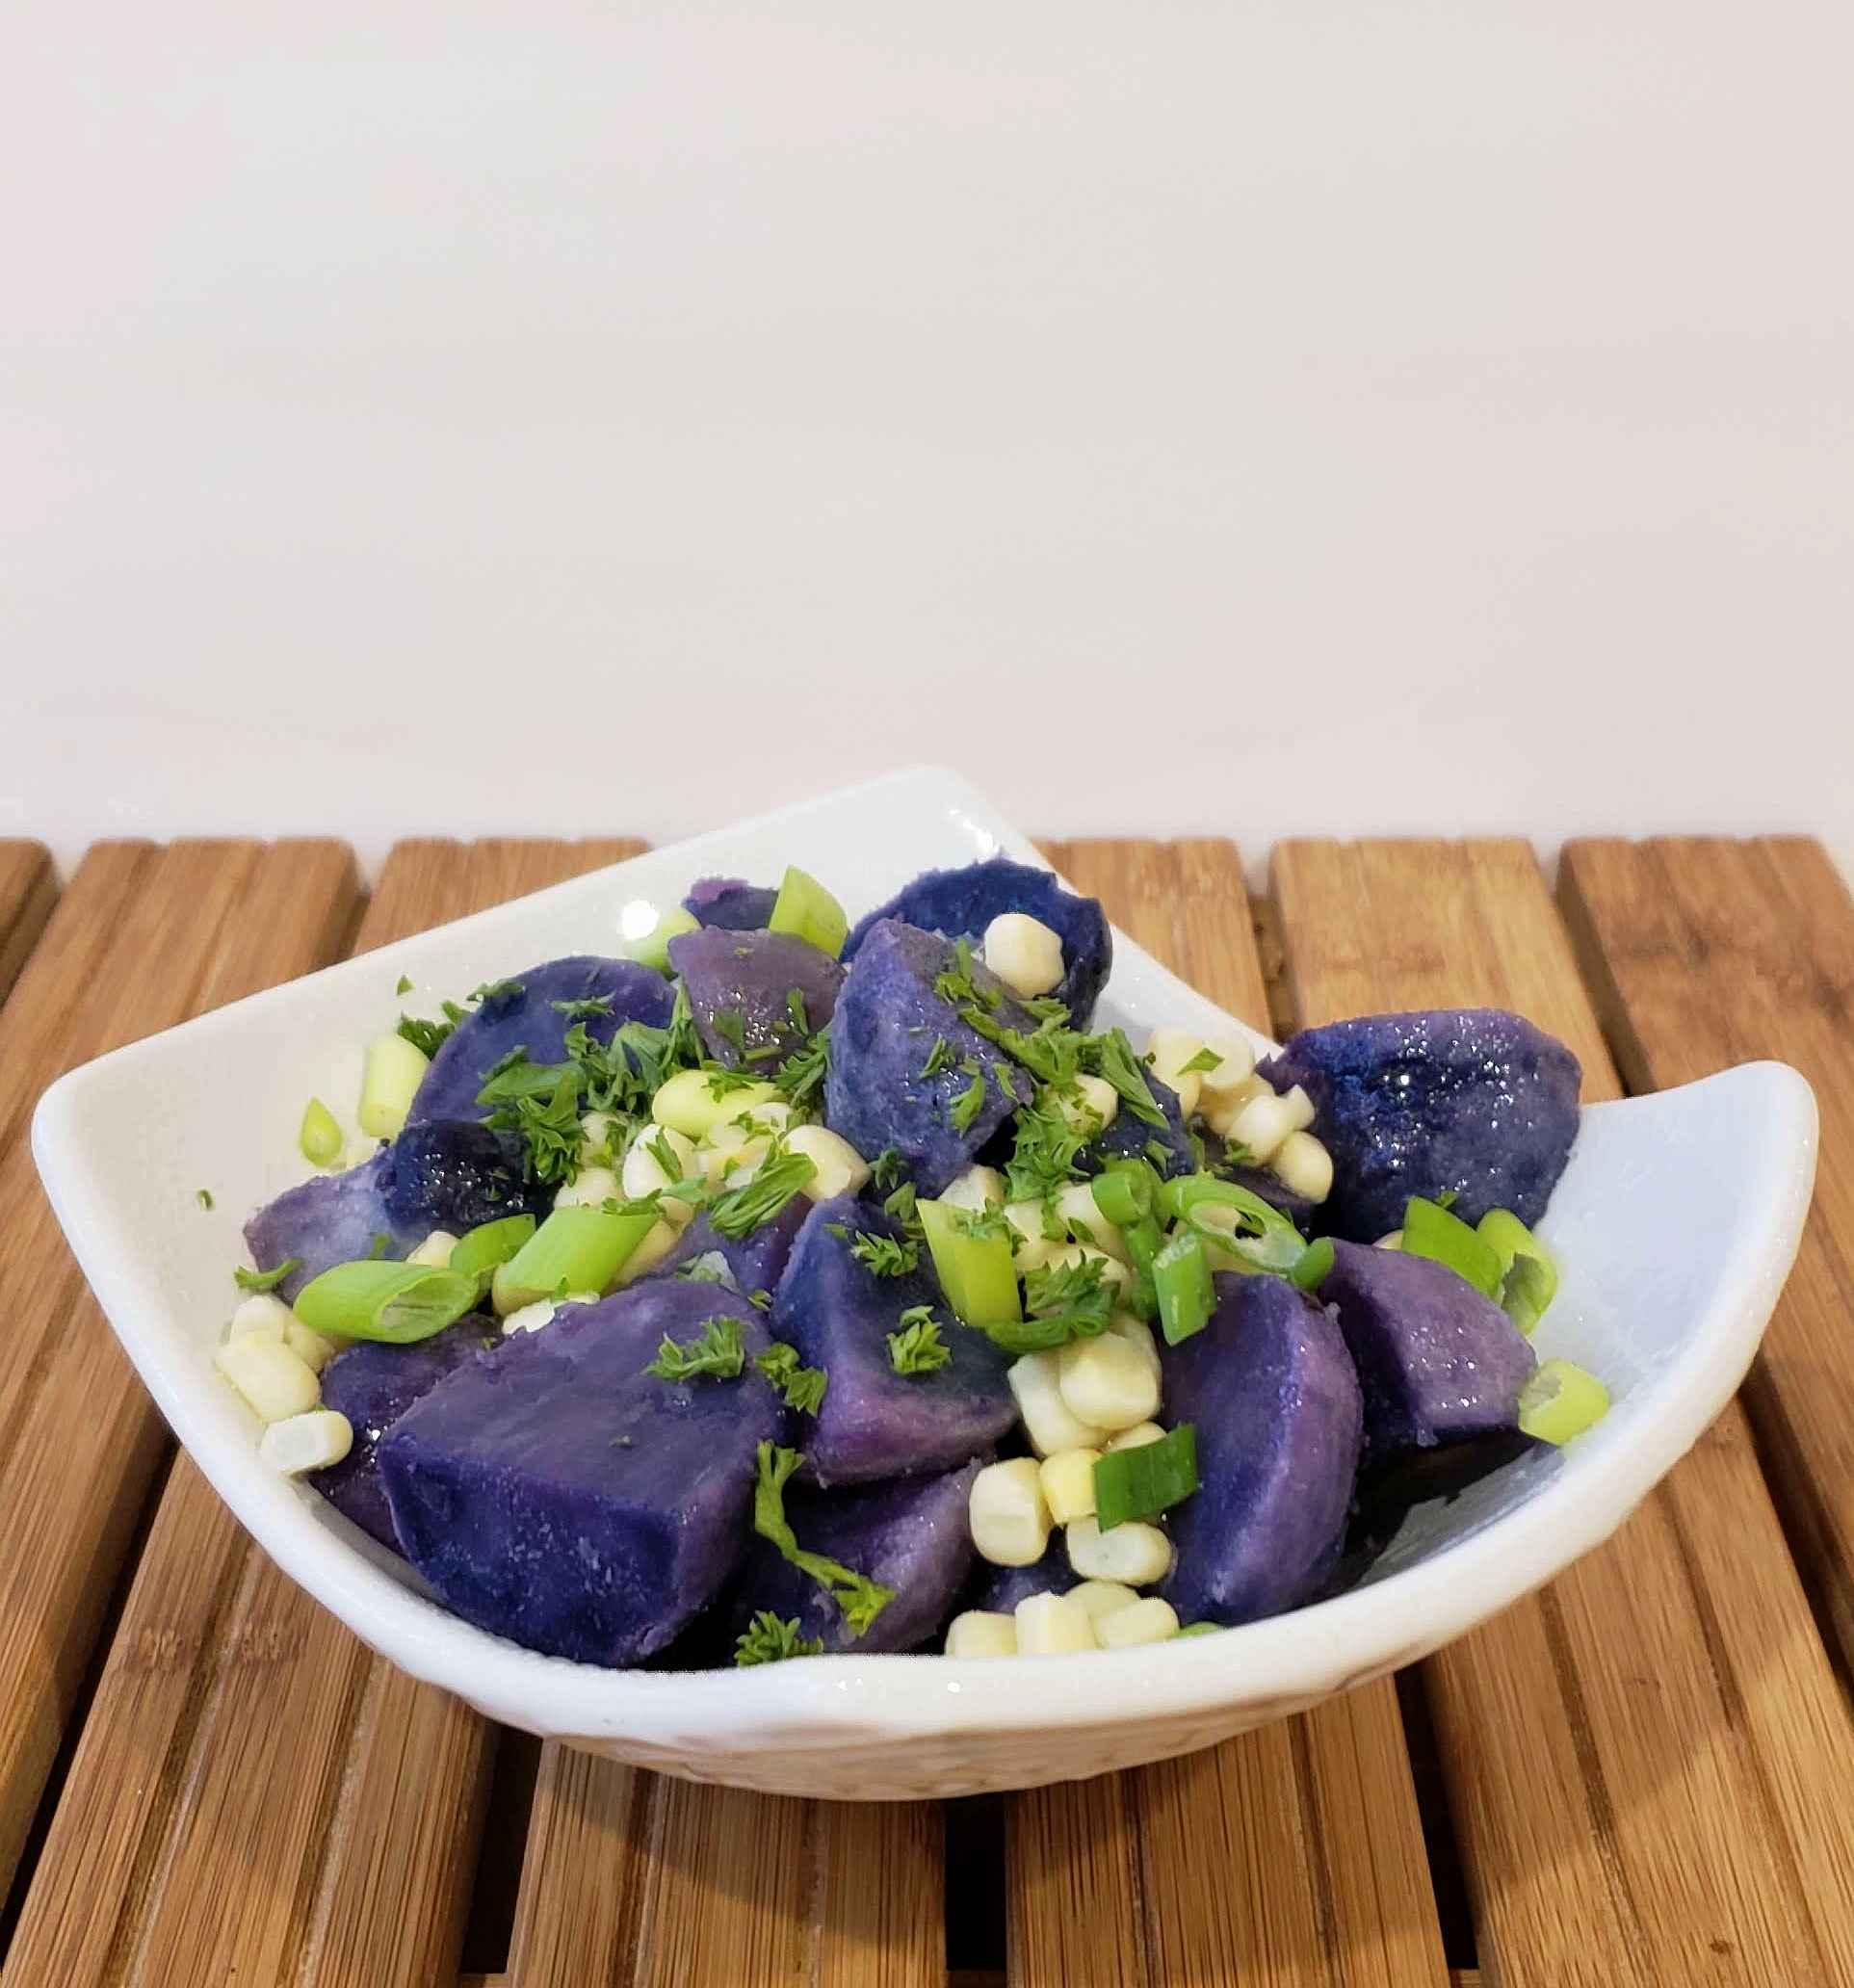 Purple Potato Salad from Shabbos Under Pressure